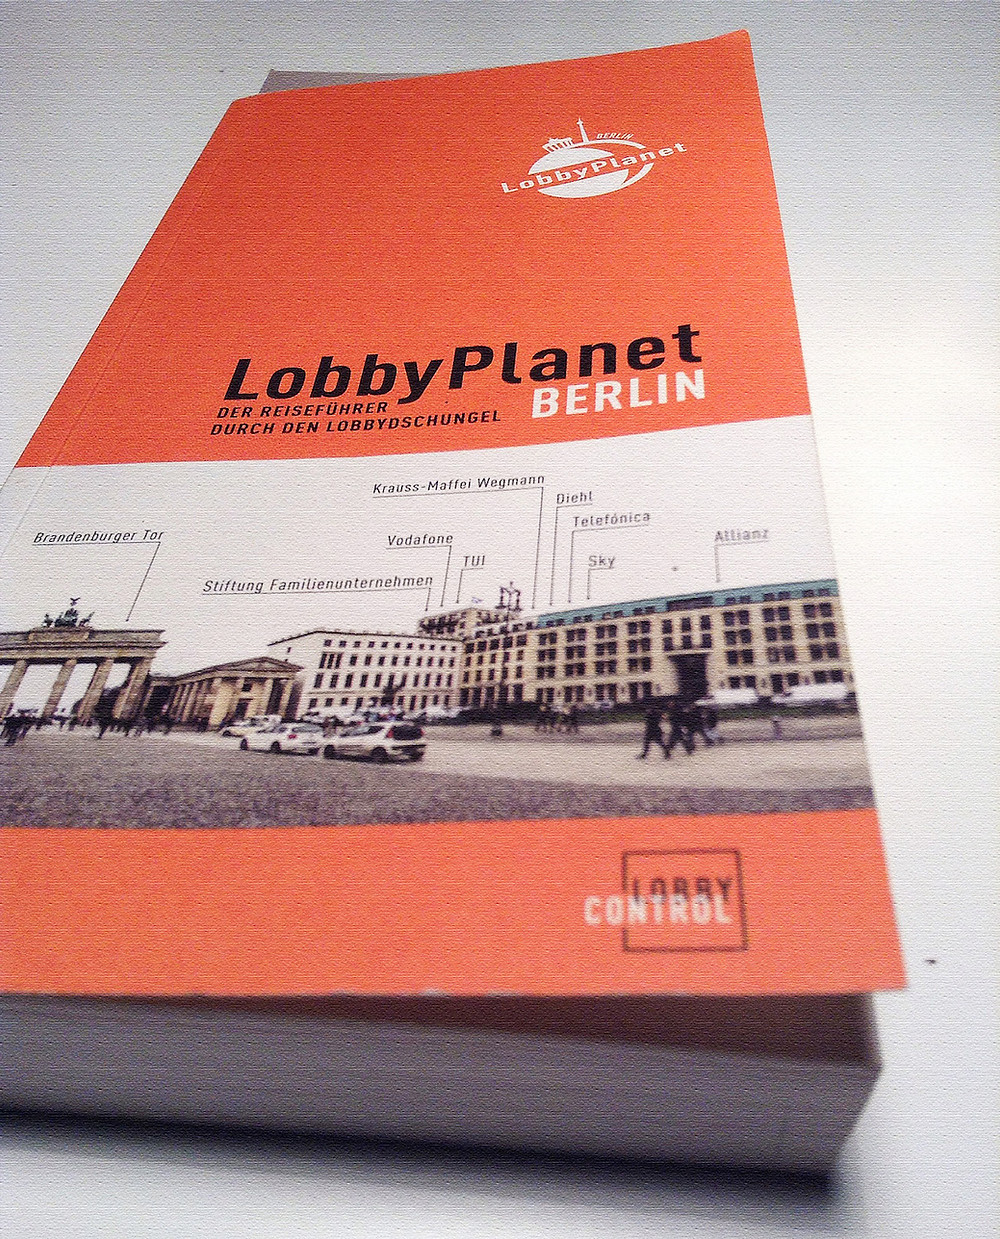 Lobby Planet Berlin Ταξιδιωτικός Οδηγός Βερολίνου